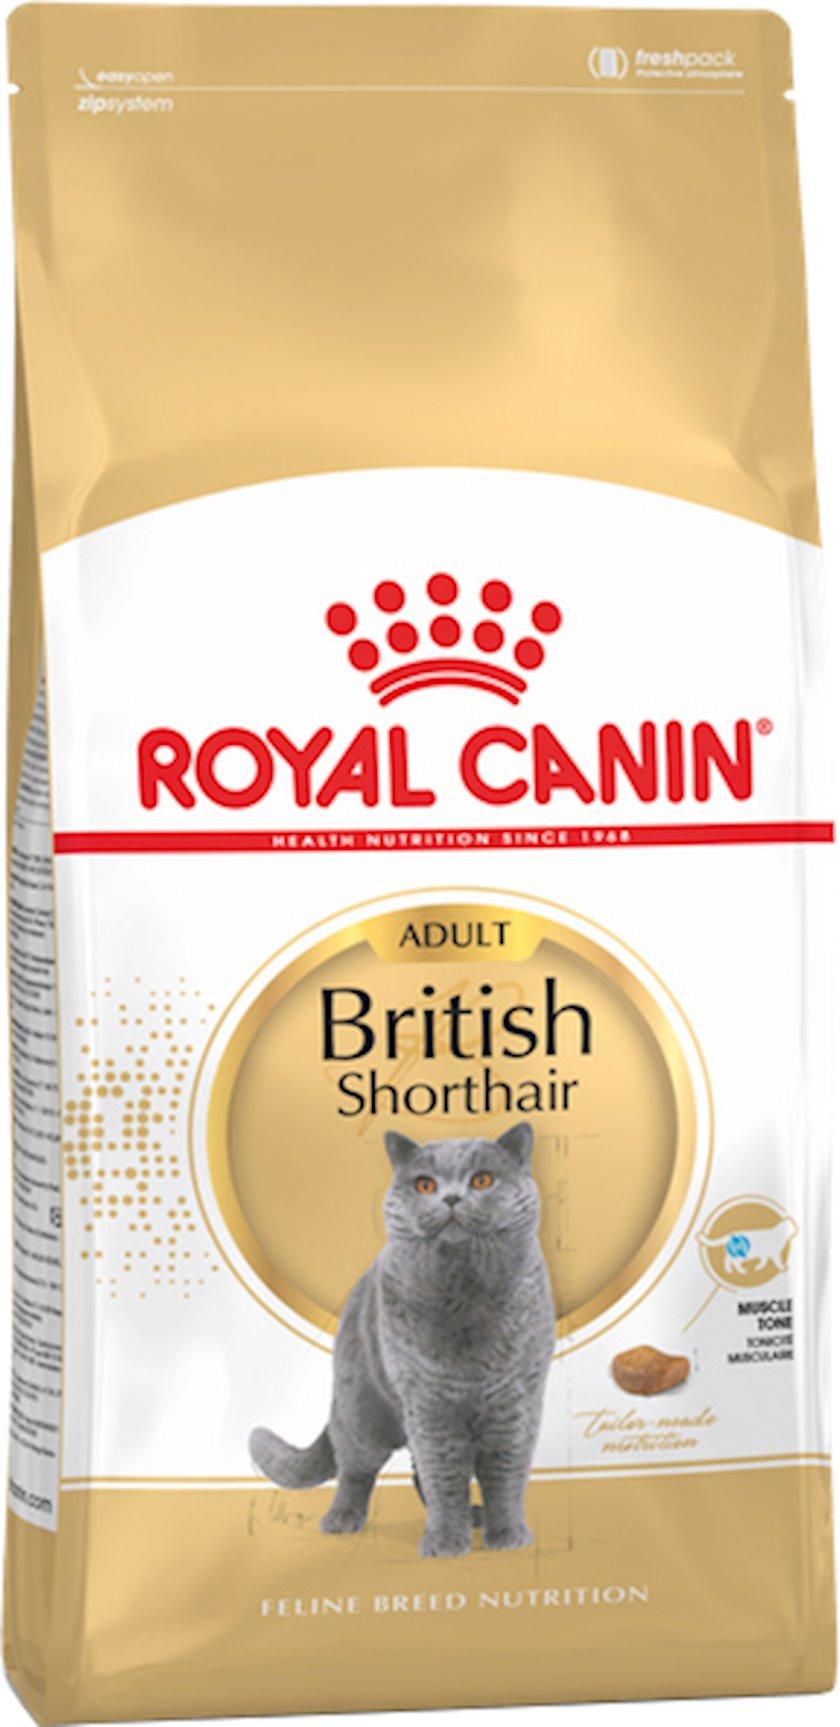 Quru yem Royal Canin British Shorthair Adult 400 q